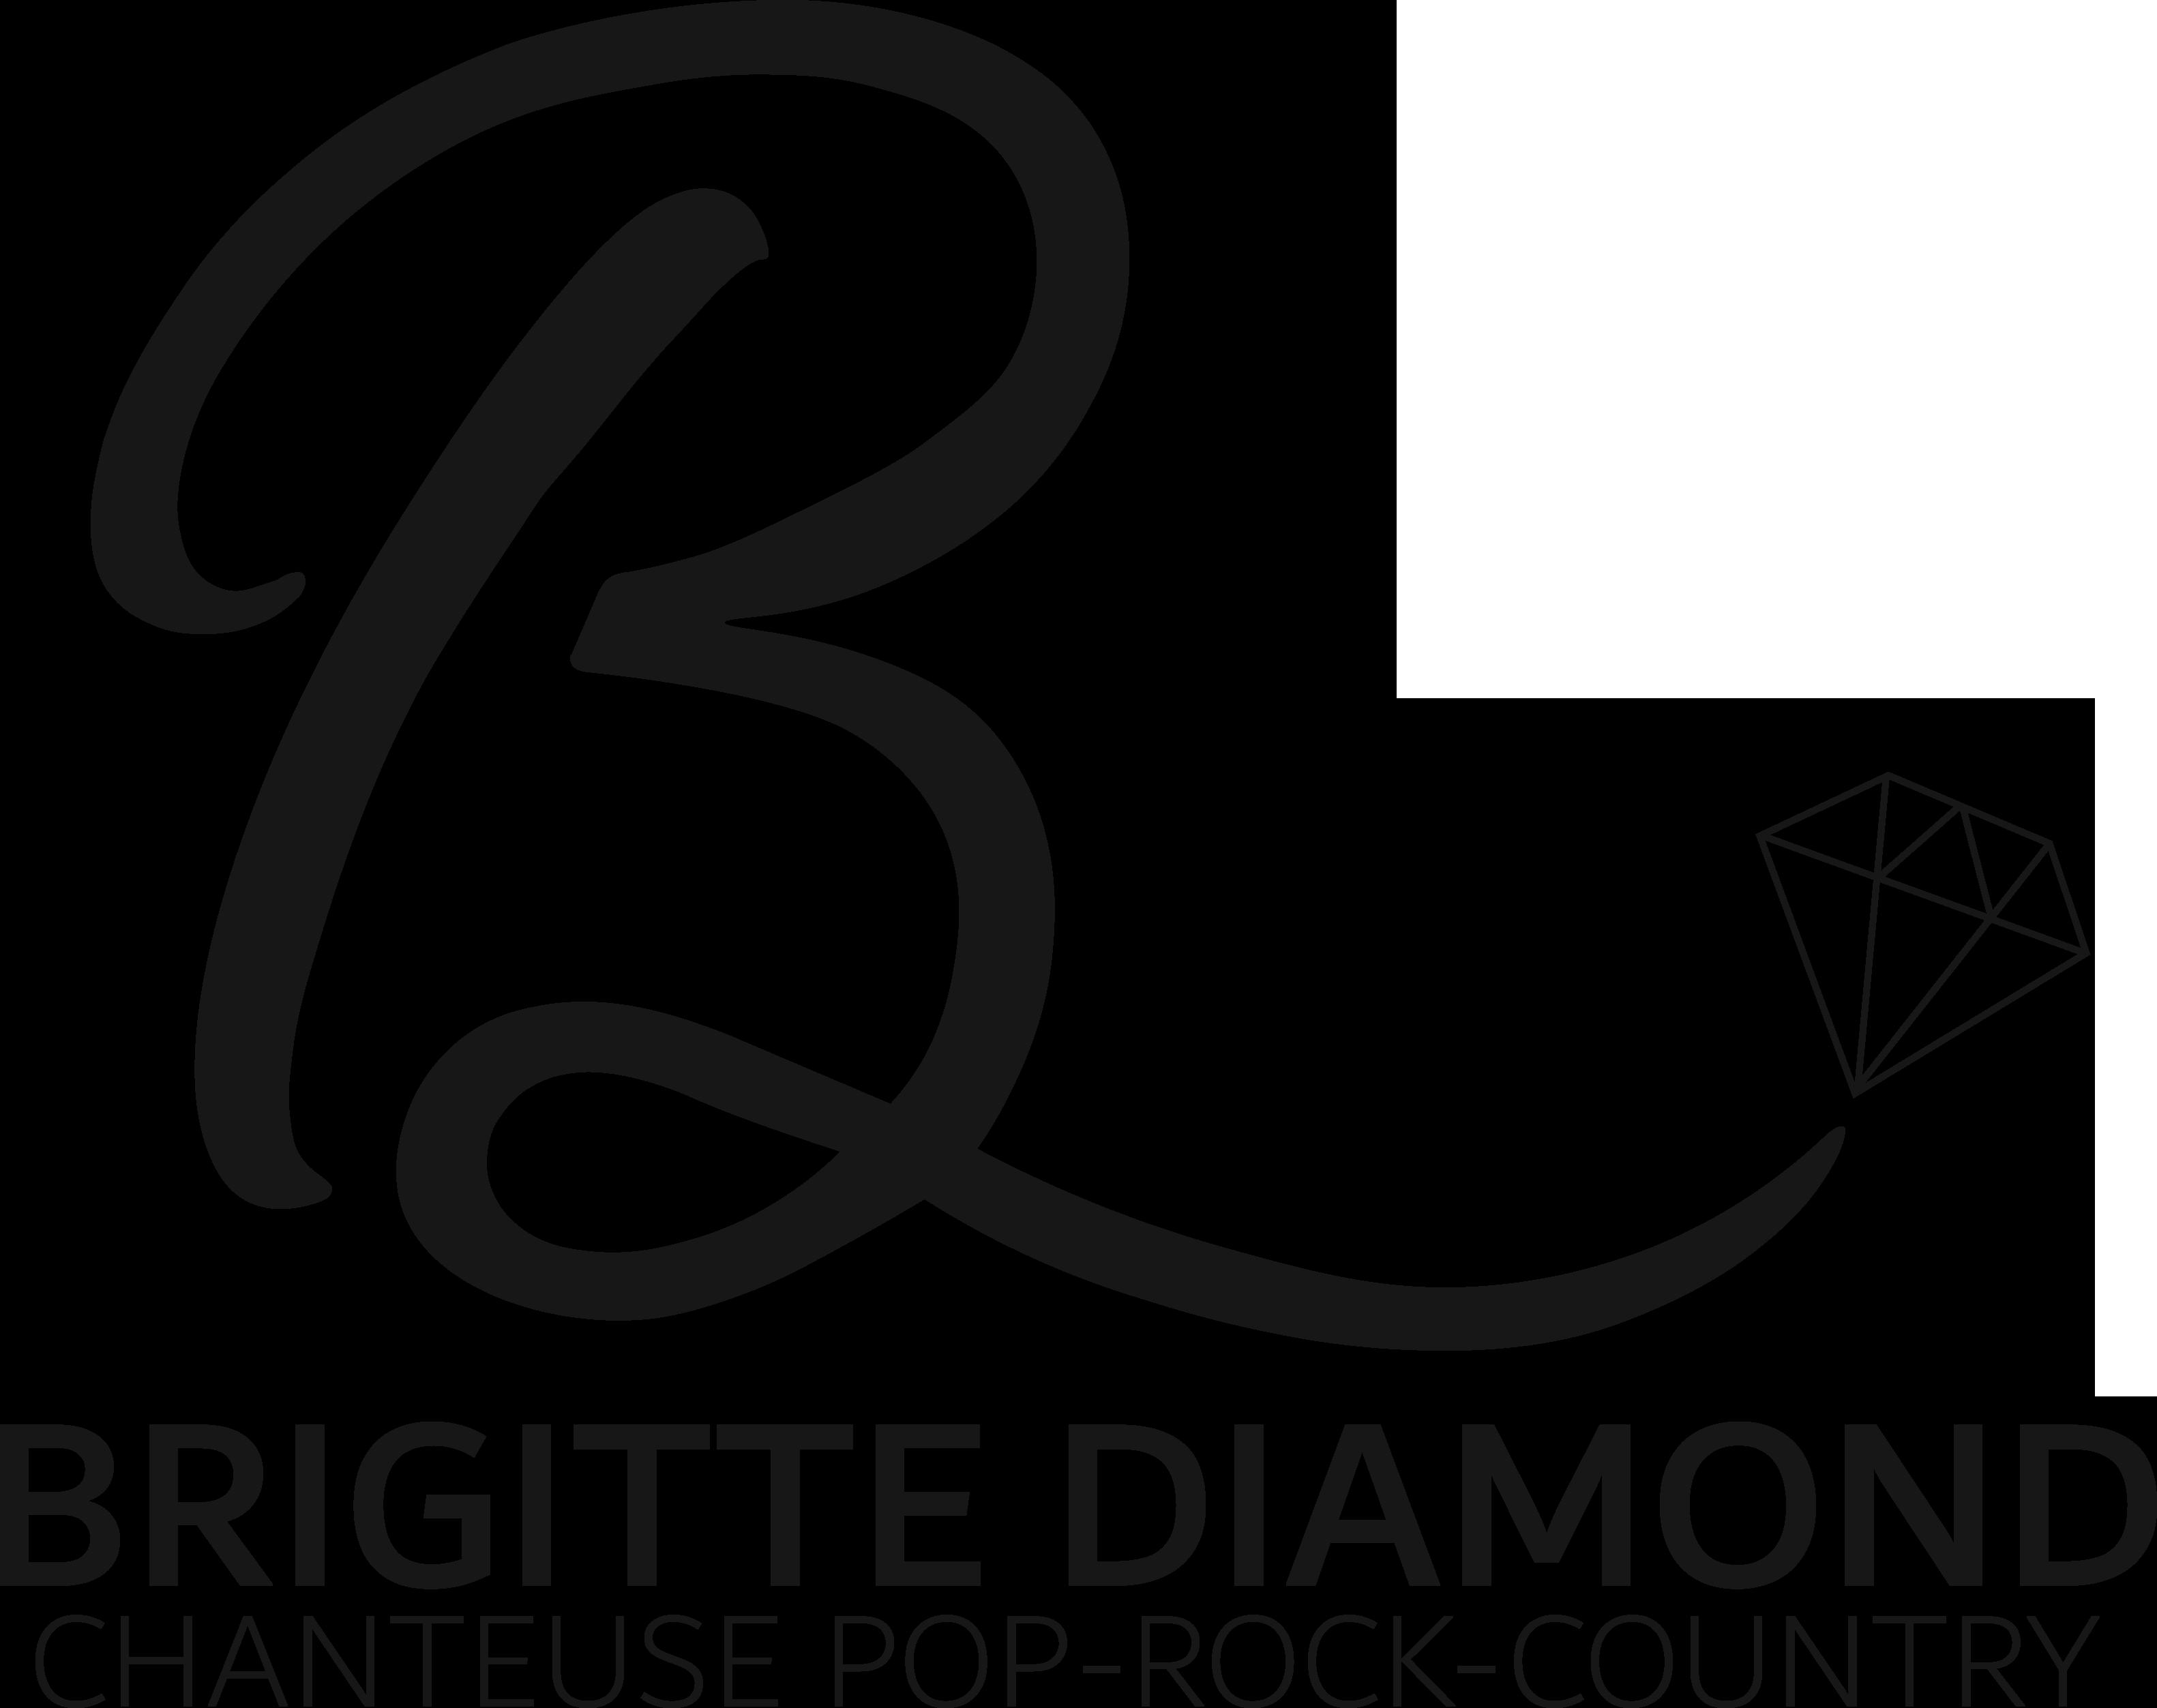 Brigitte Diamond